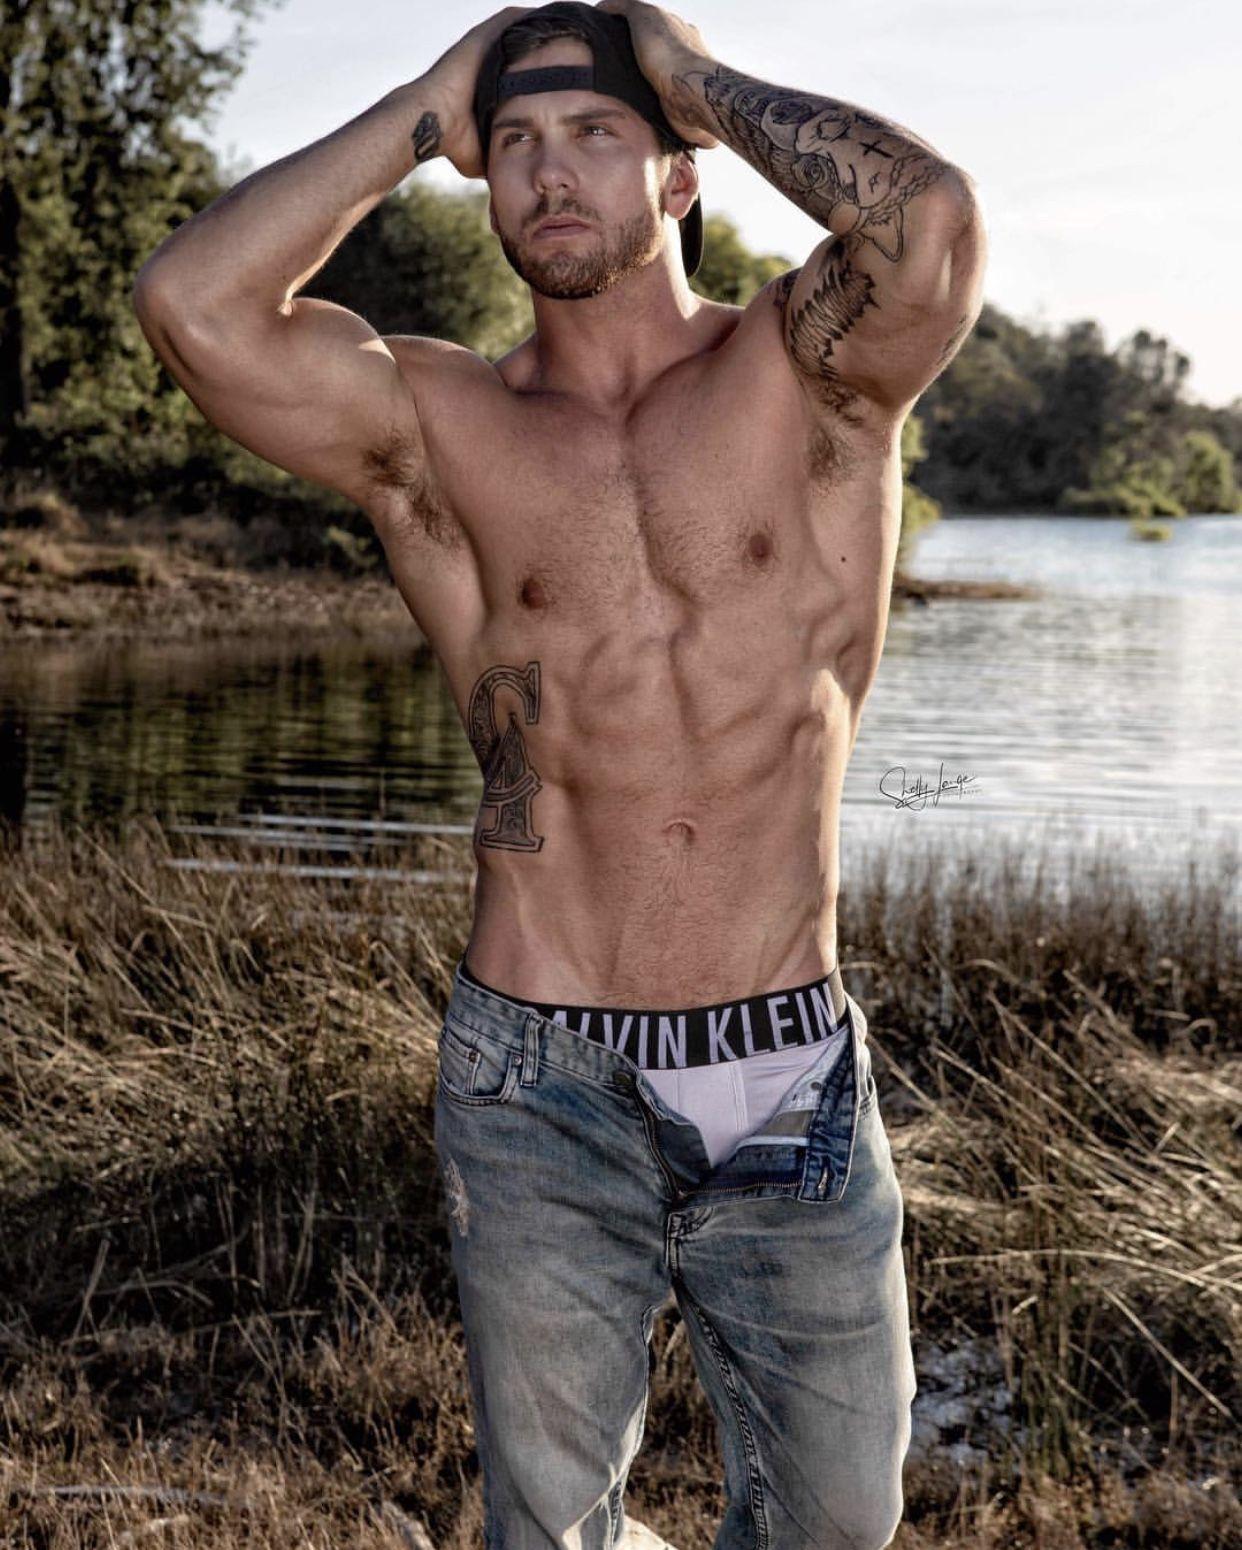 hot-country-men-nude-latina-sex-take-photos